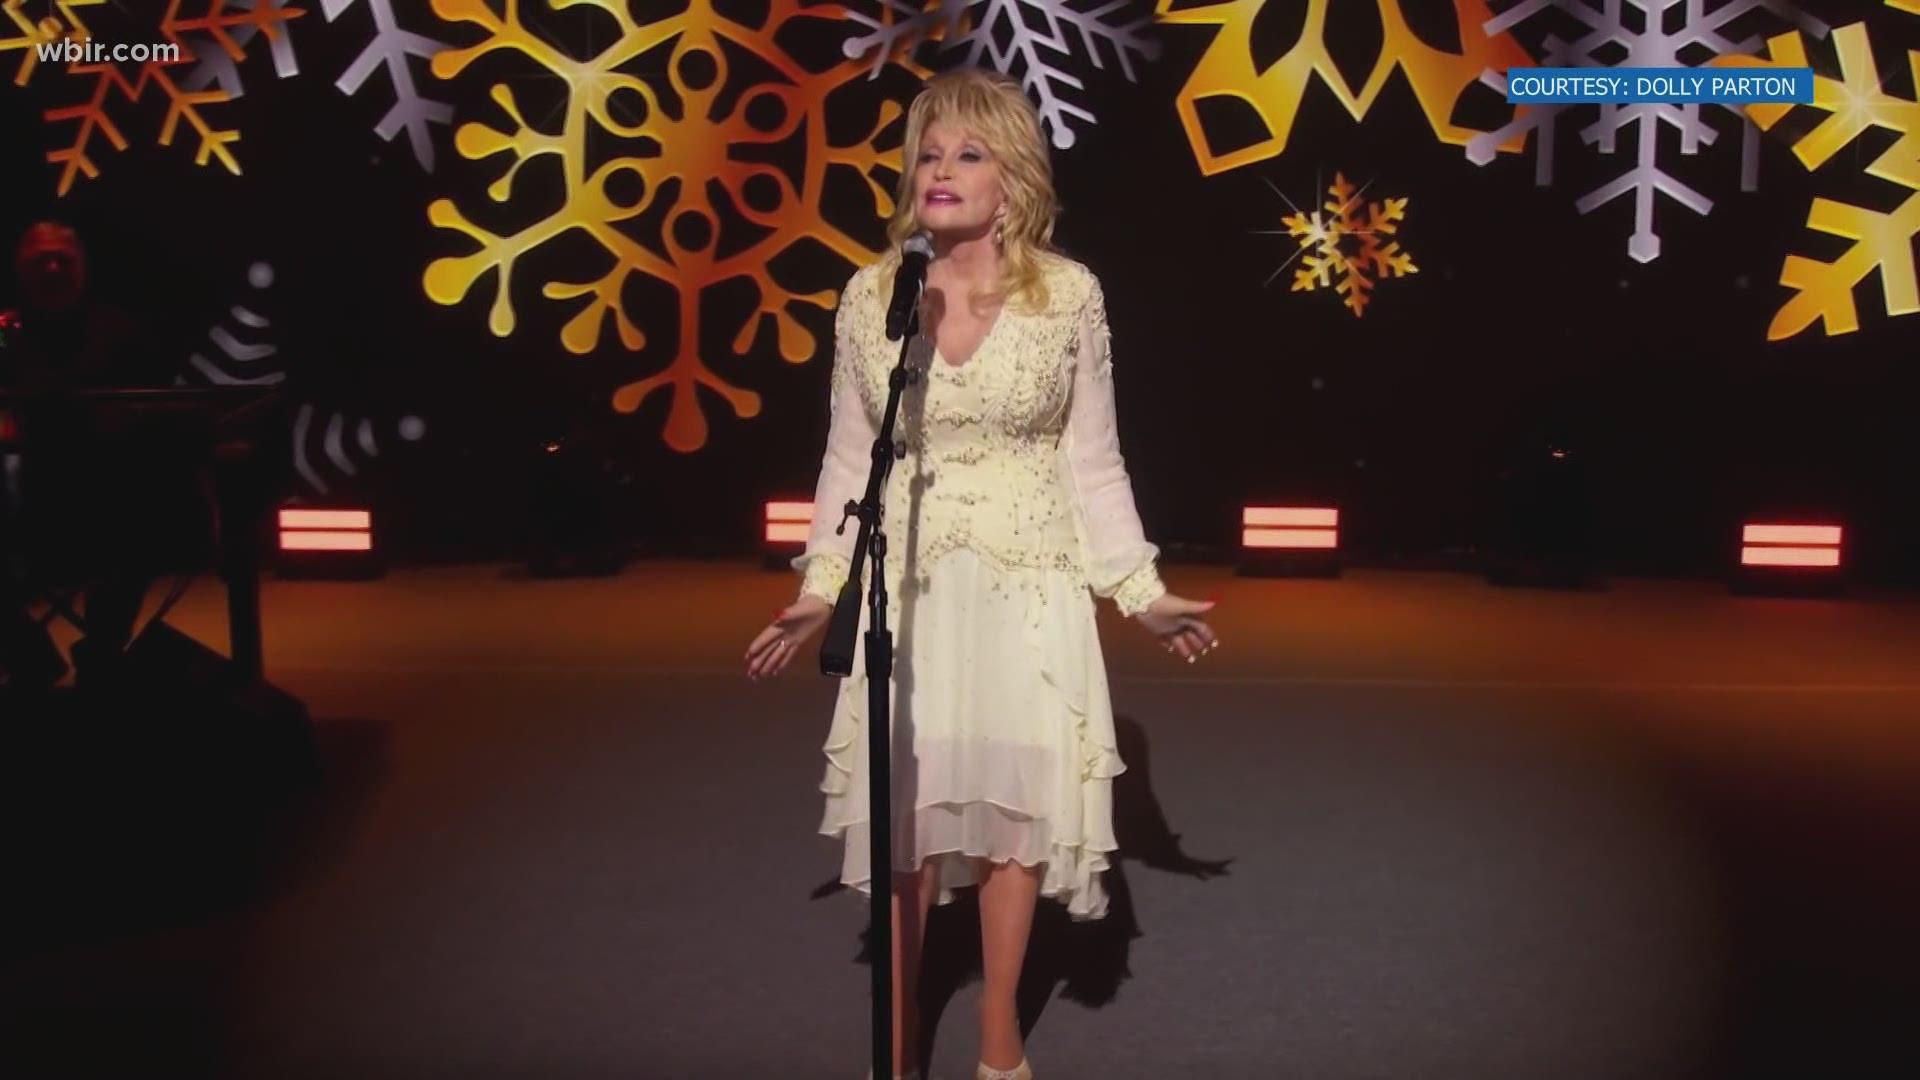 Happy 75th Birthday To Dolly Parton Wbir Com